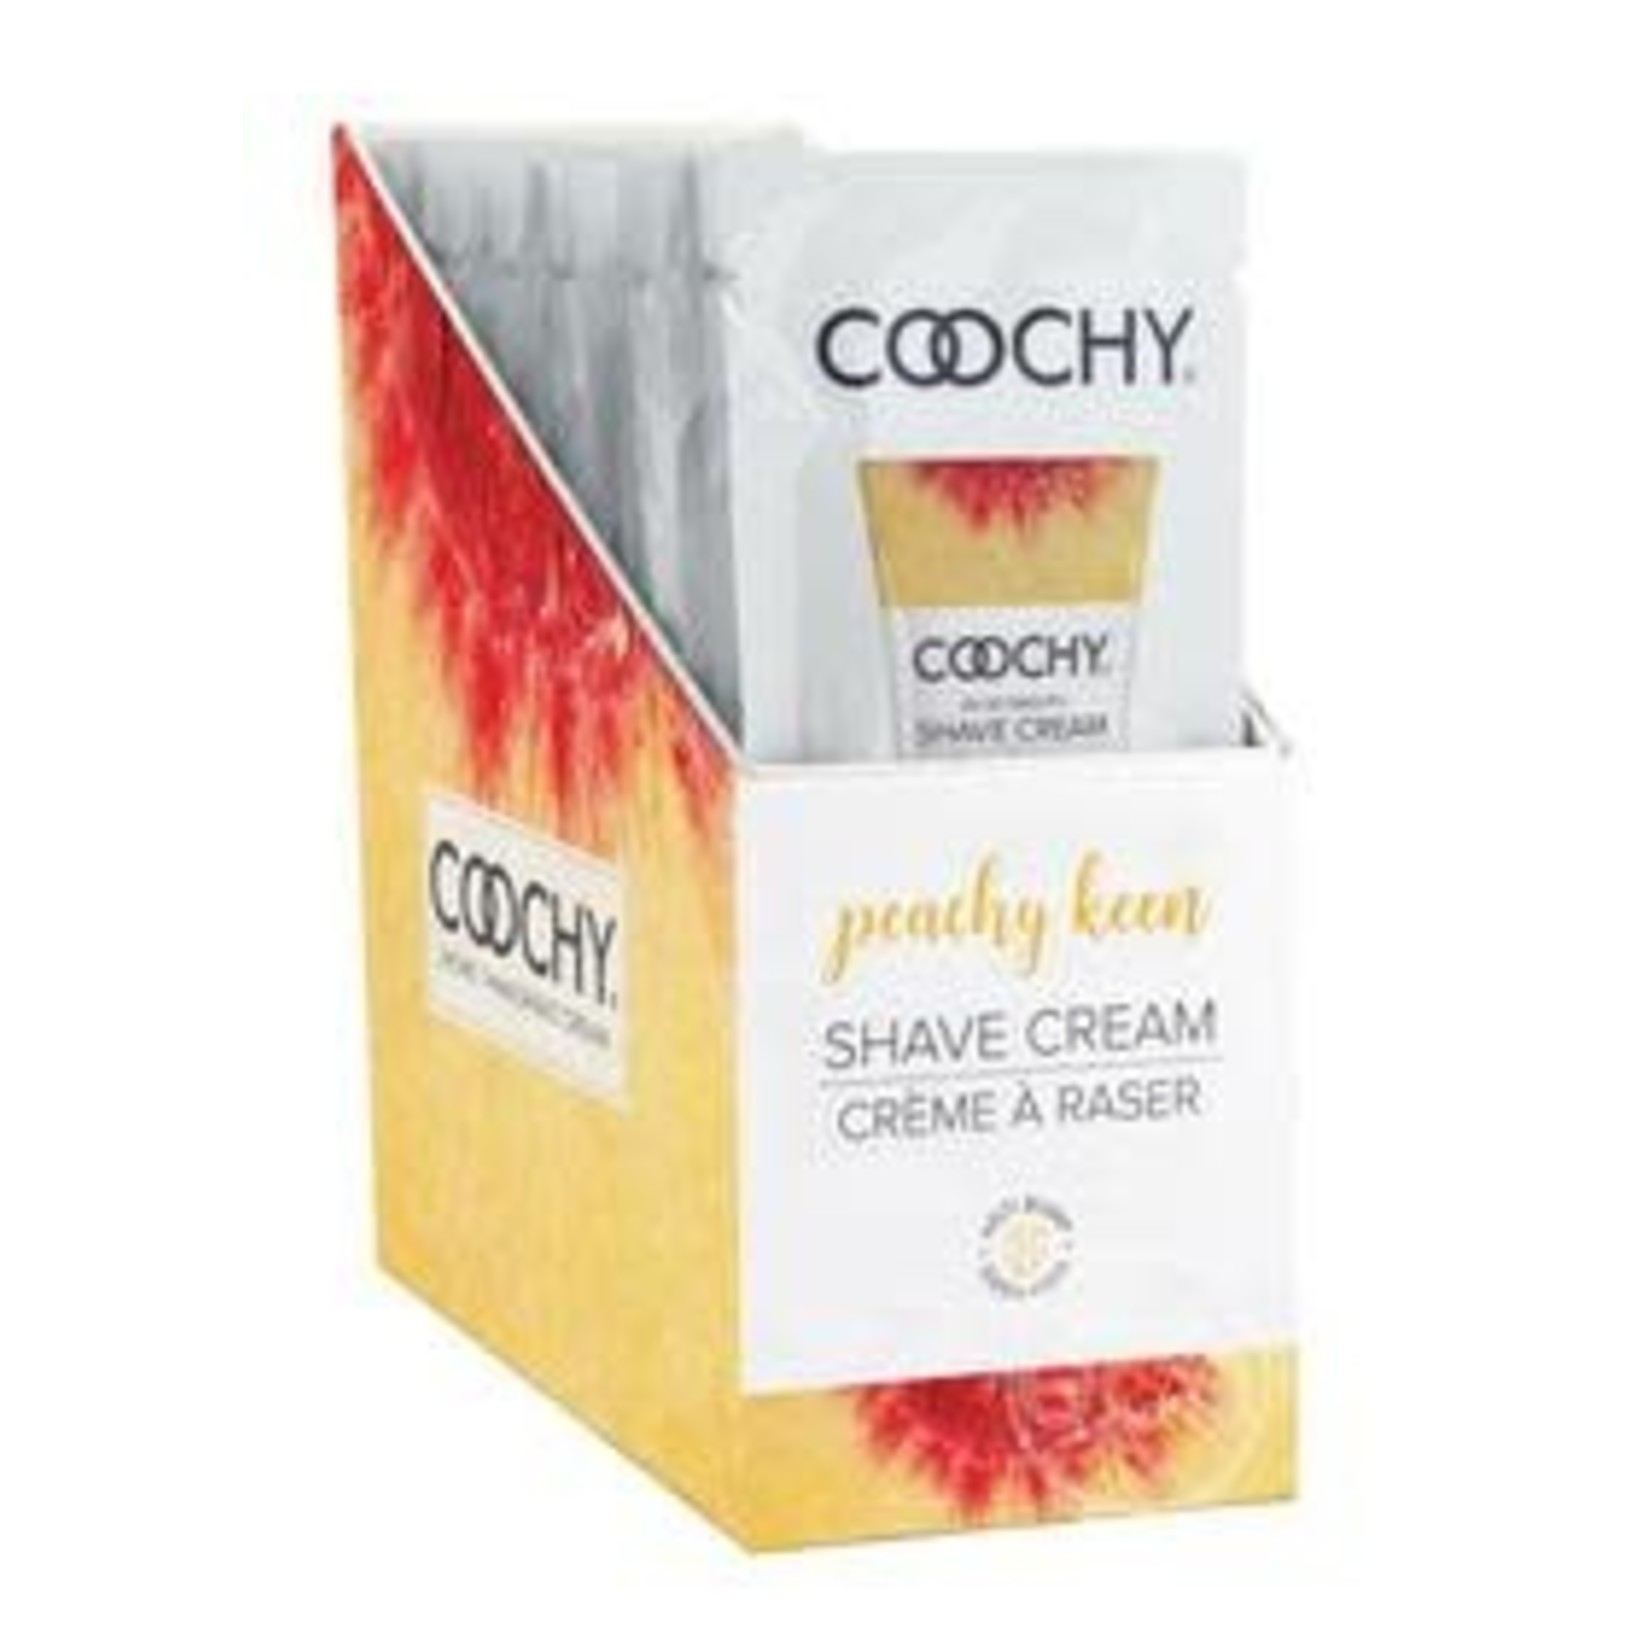 Coochy Shave Cream-Peachy Keen 15ml Foil